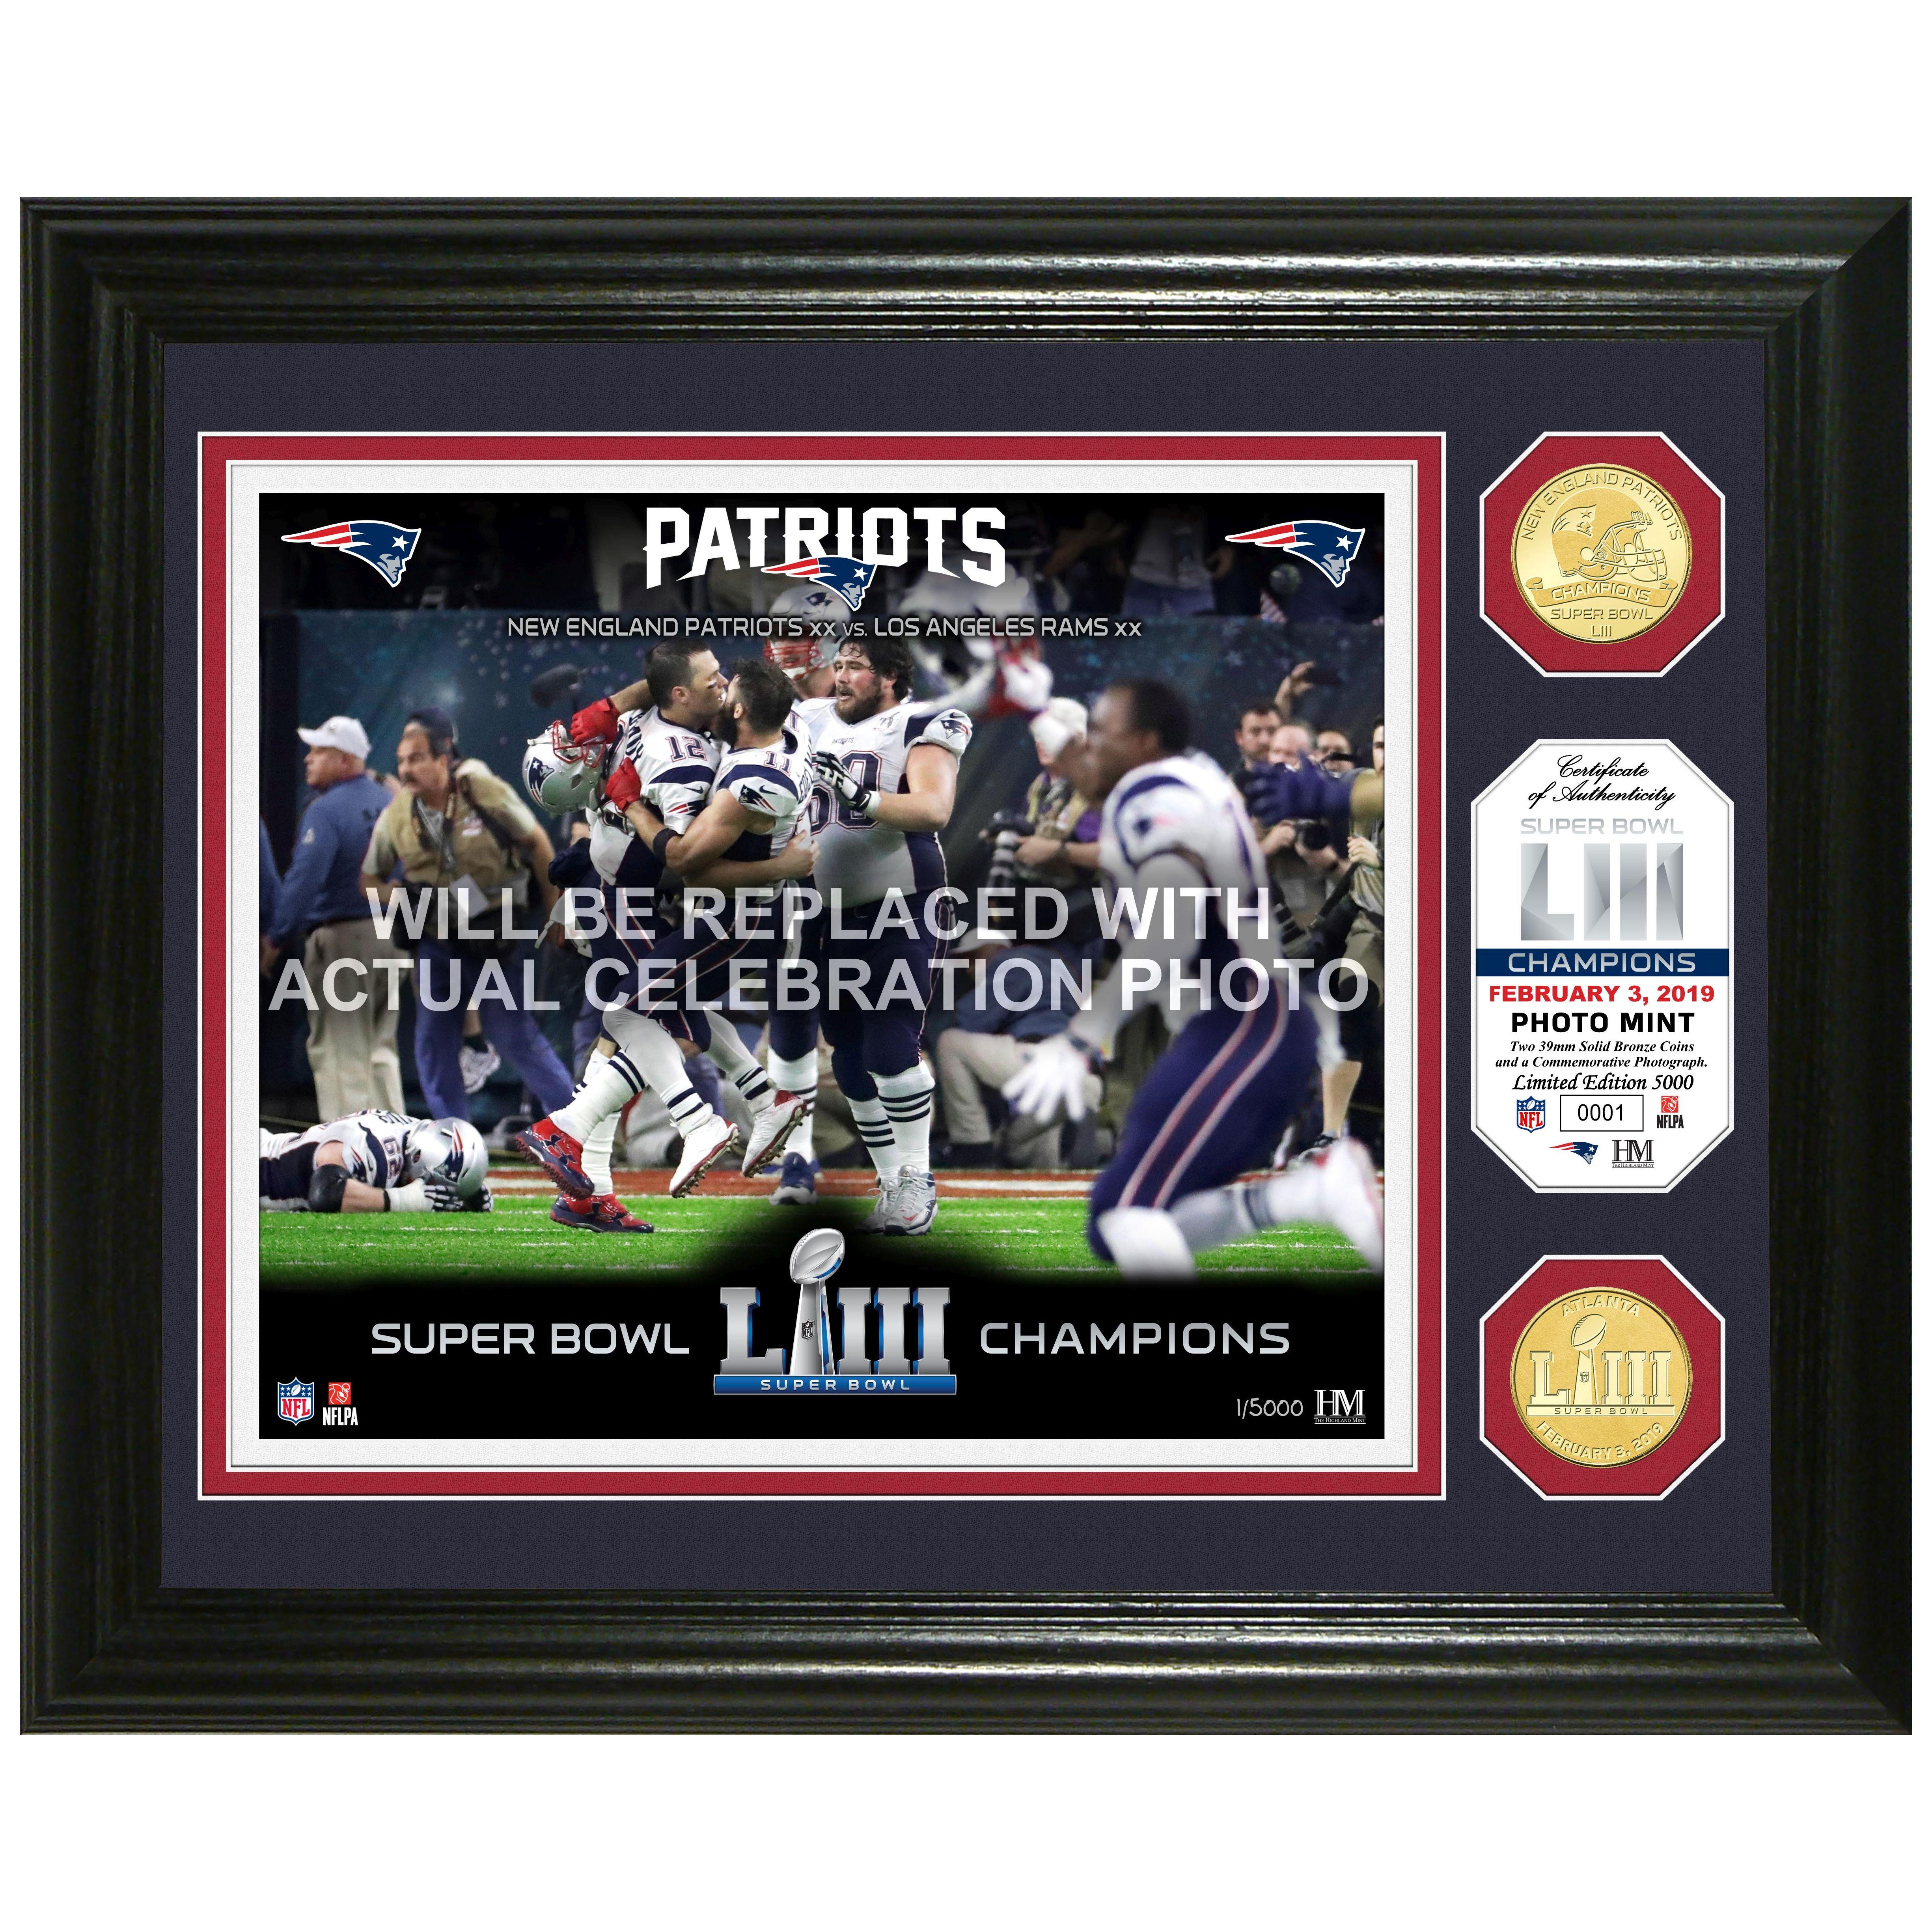 New England Patriots Super Bowl 53 Champions Celebration Bronze Coin Photo Mint